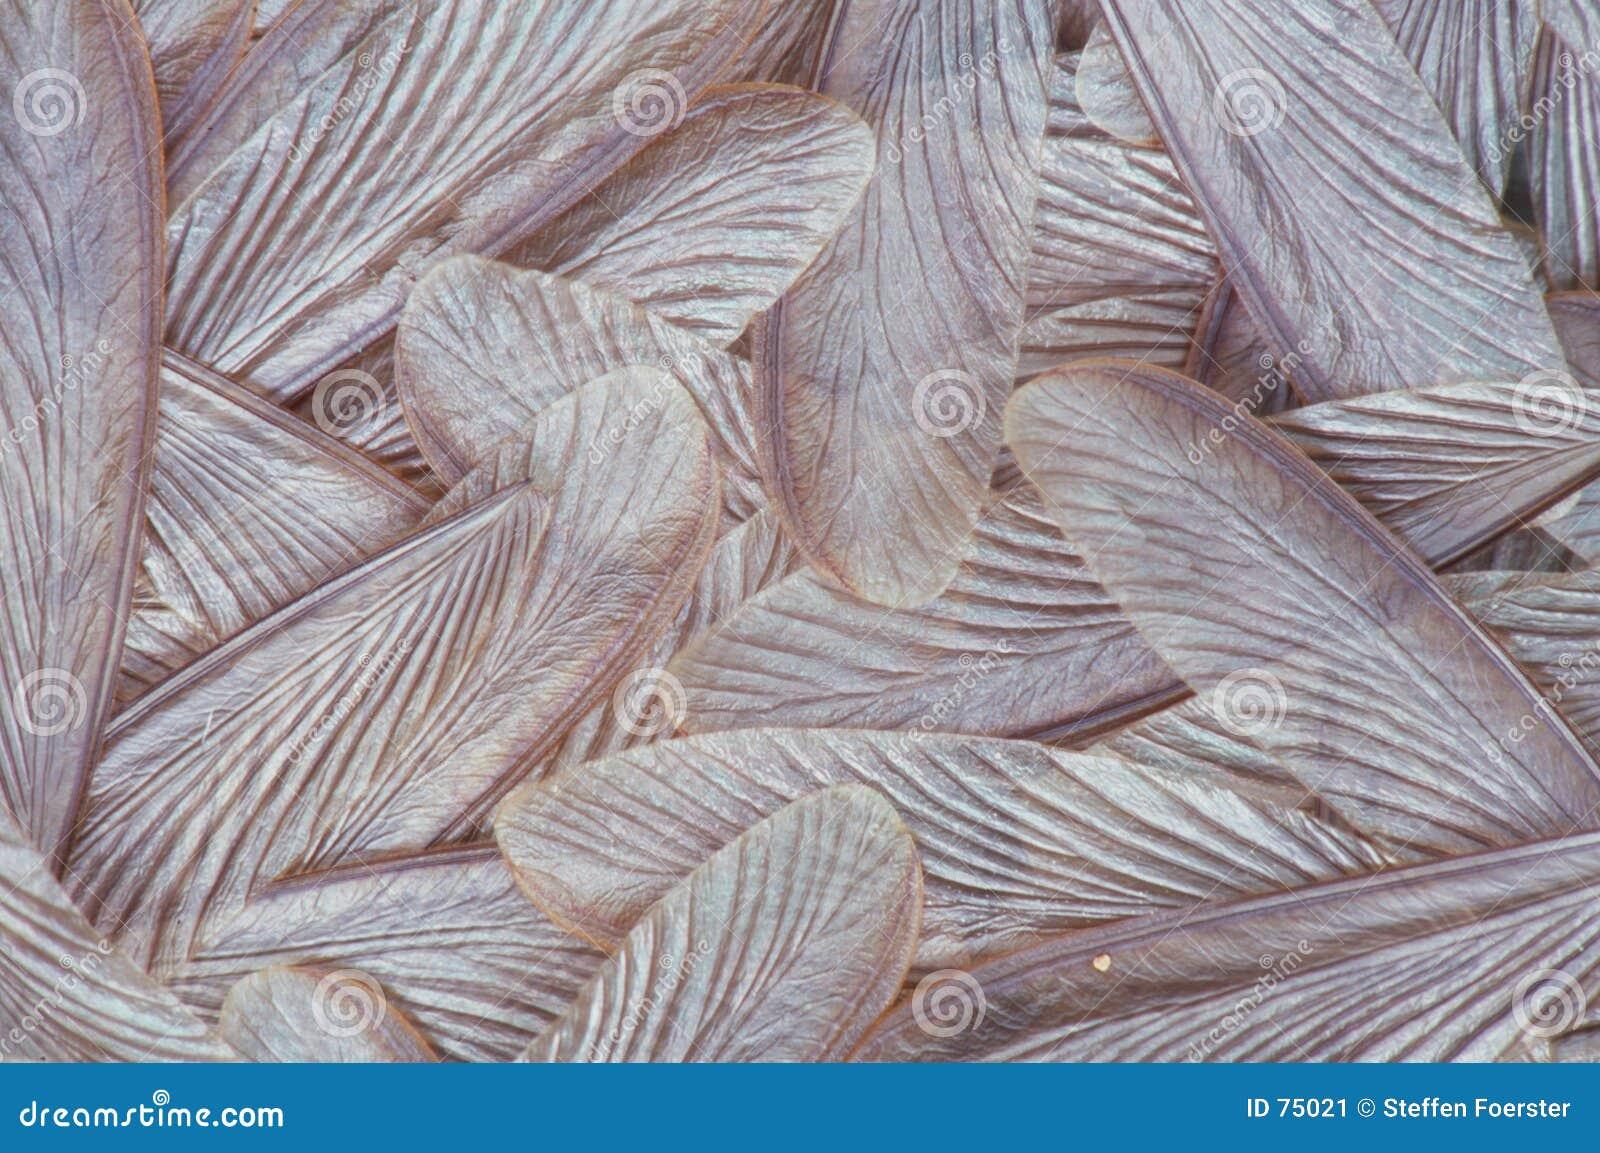 Ailes de termite